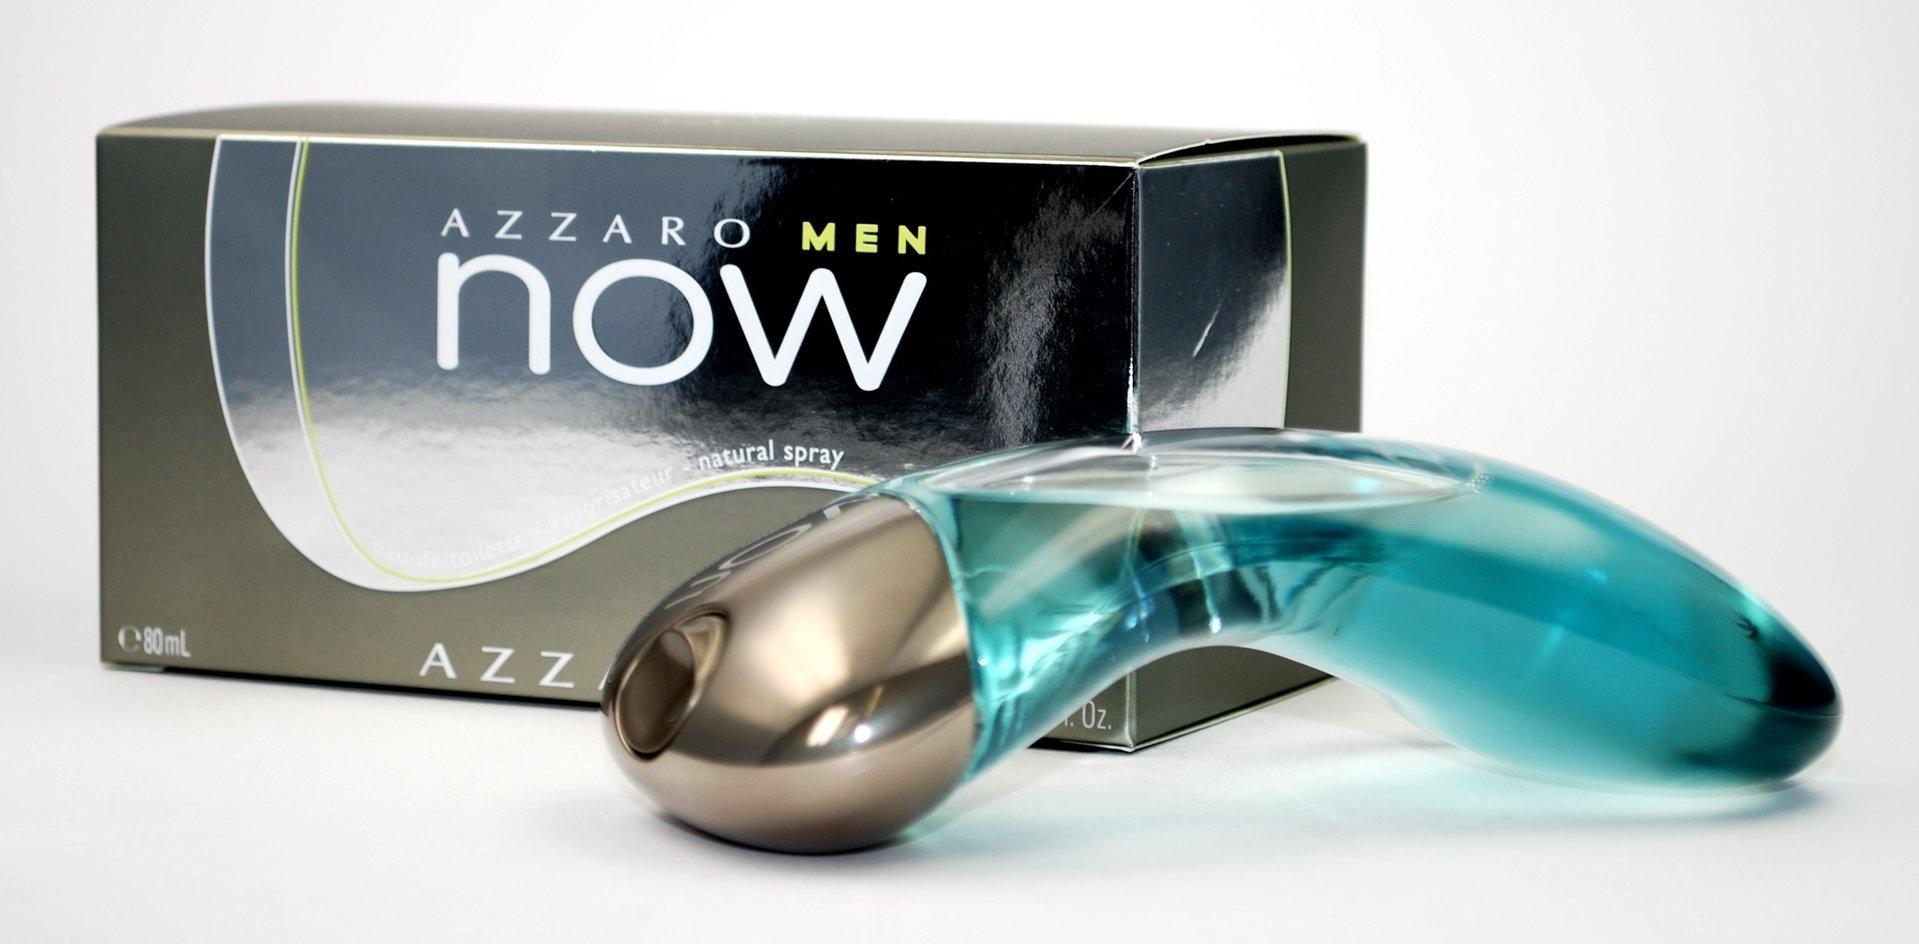 Azzaro Now Men toaletní voda